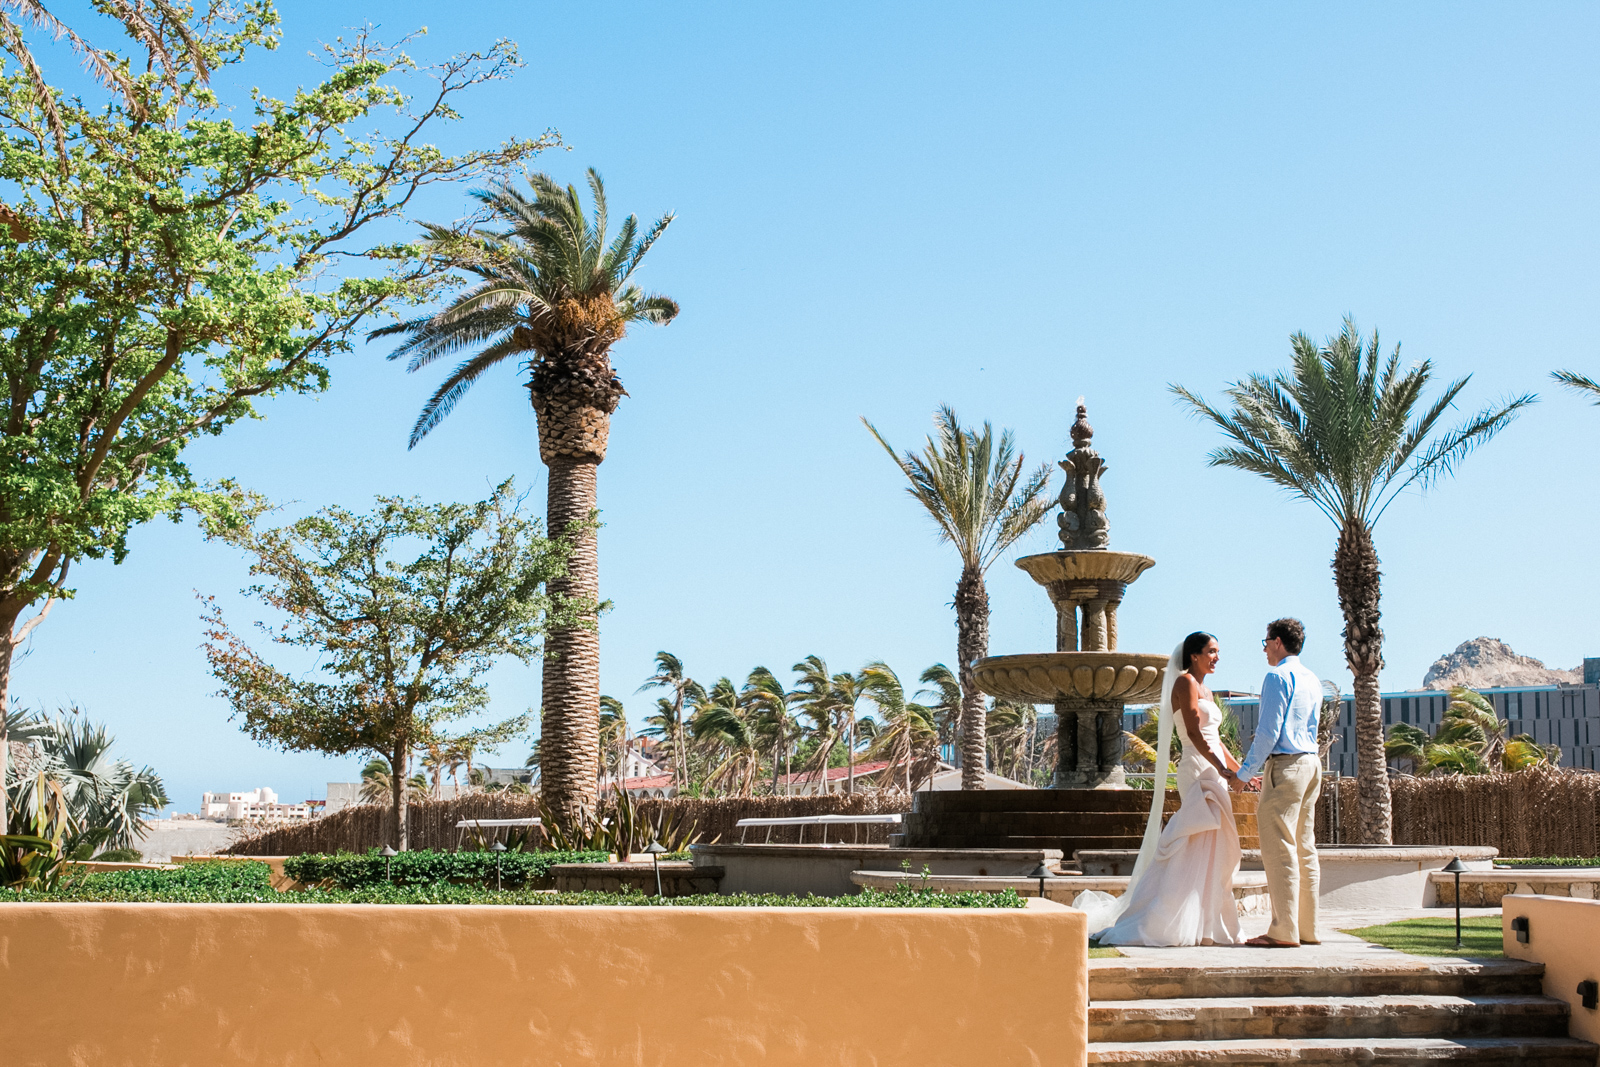 0021_Destination_Wedding_Film_Photographer_Cabo_San_Lucas.jpg